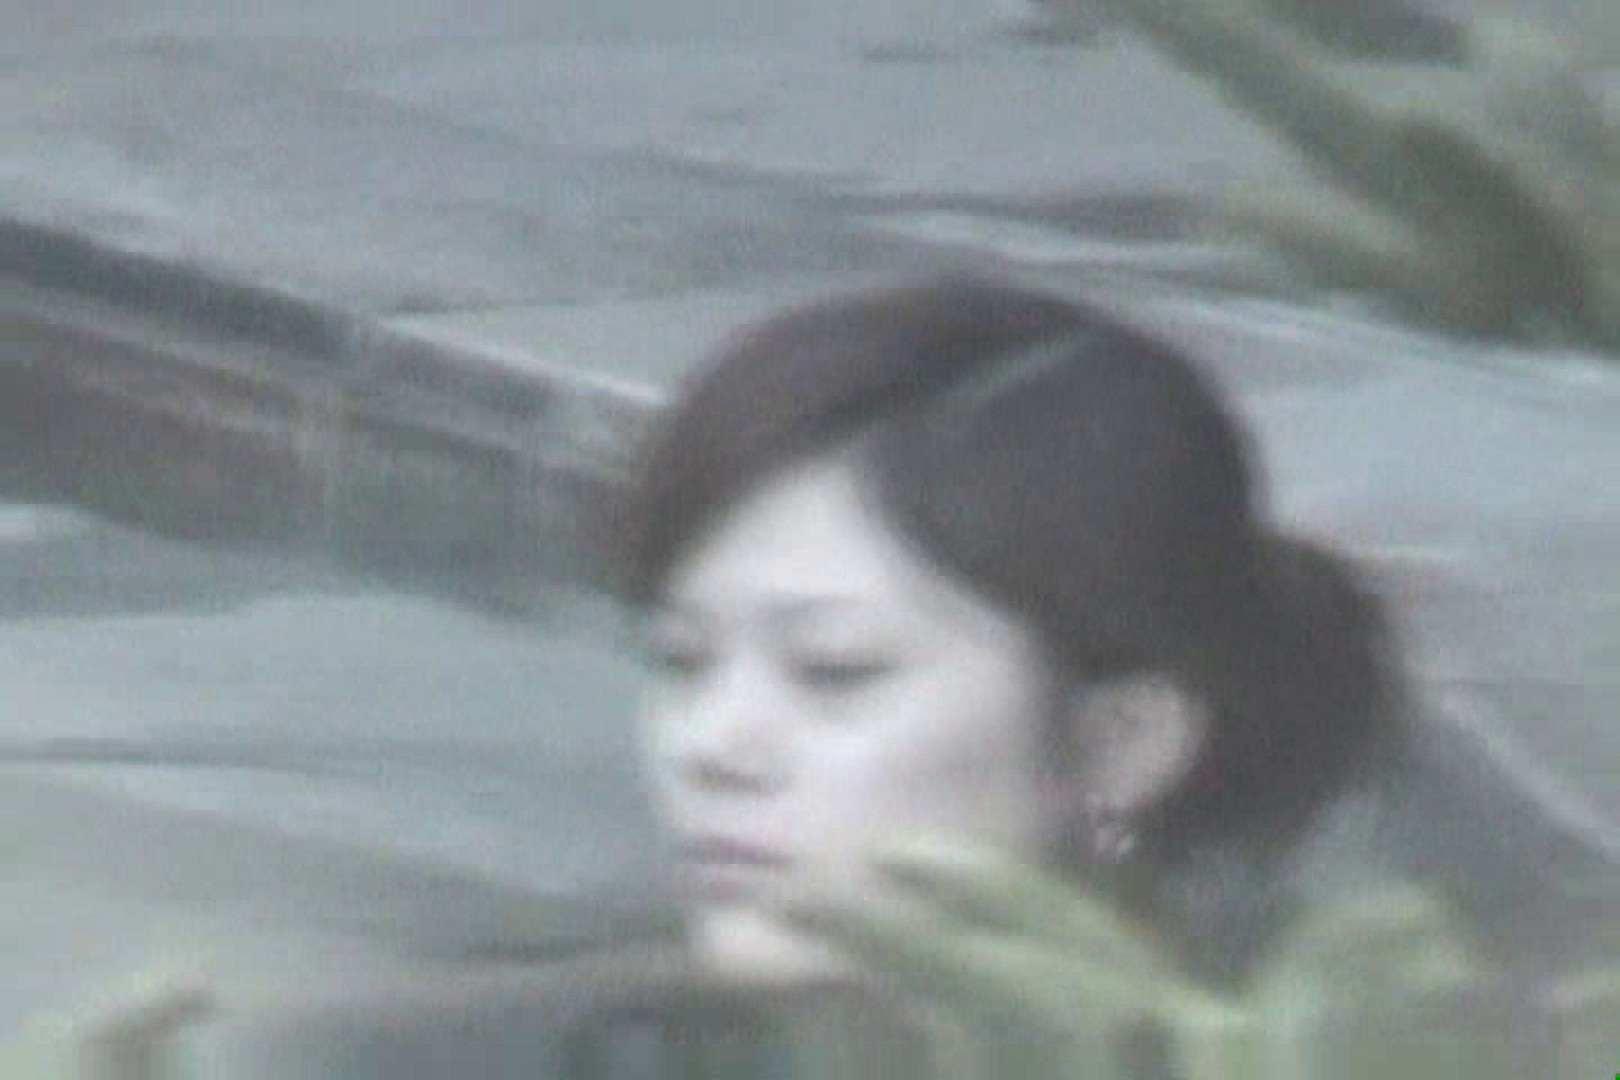 Aquaな露天風呂Vol.609 エロいOL オメコ動画キャプチャ 30枚